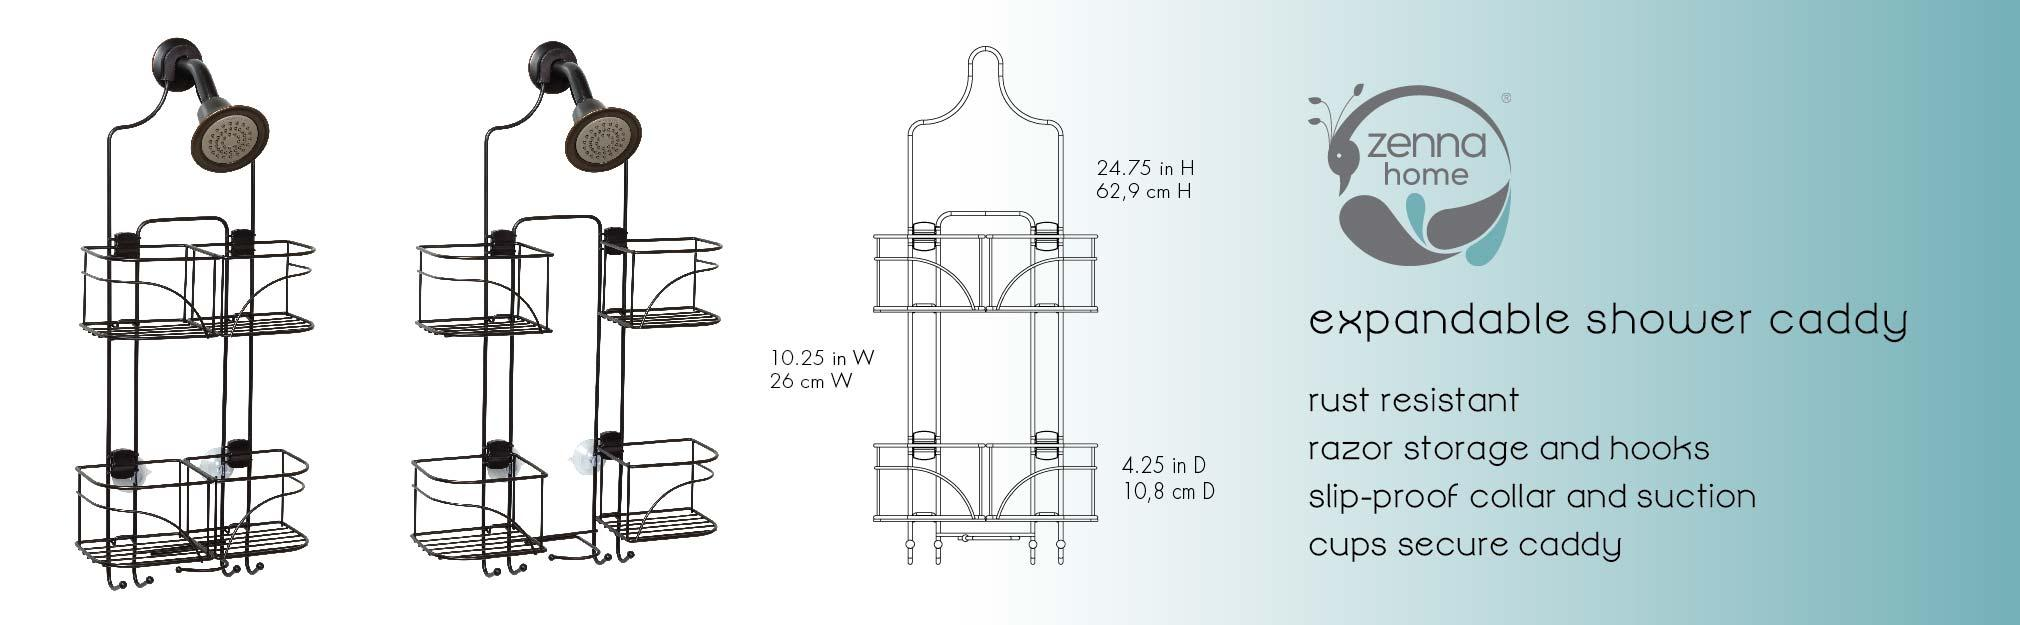 Amazon.com: Zenna Home E7446HB, Expandable Over-the-Showerhead Caddy ...